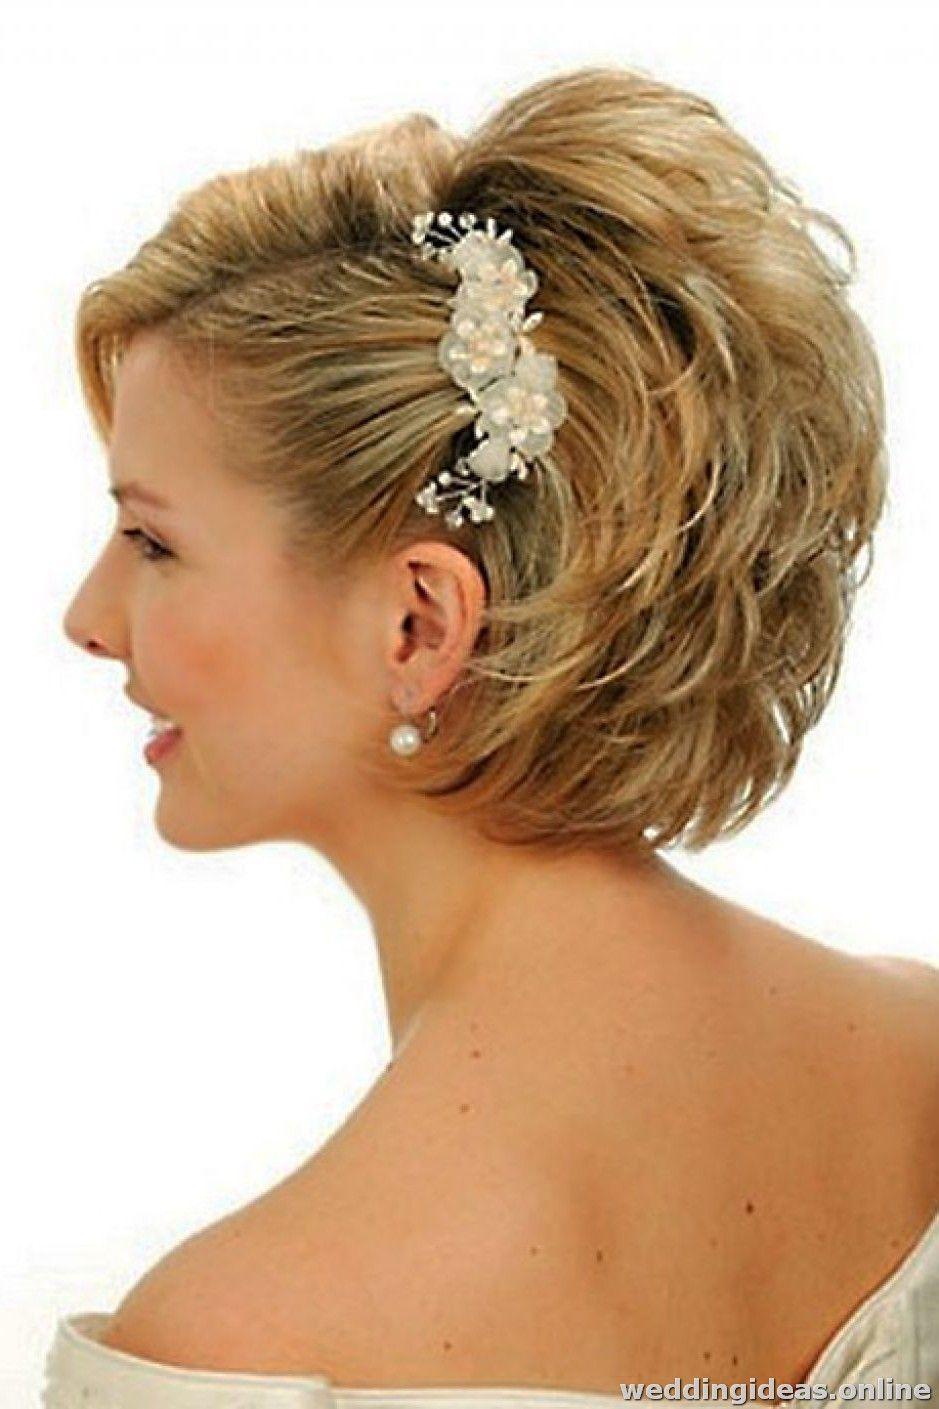 50 Schonsten Ideen Fur Brautfrisuren Hochzeitsfrisuren Kurze Haare Brautfrisur Kurze Haare Kurze Hochzeitsfrisuren